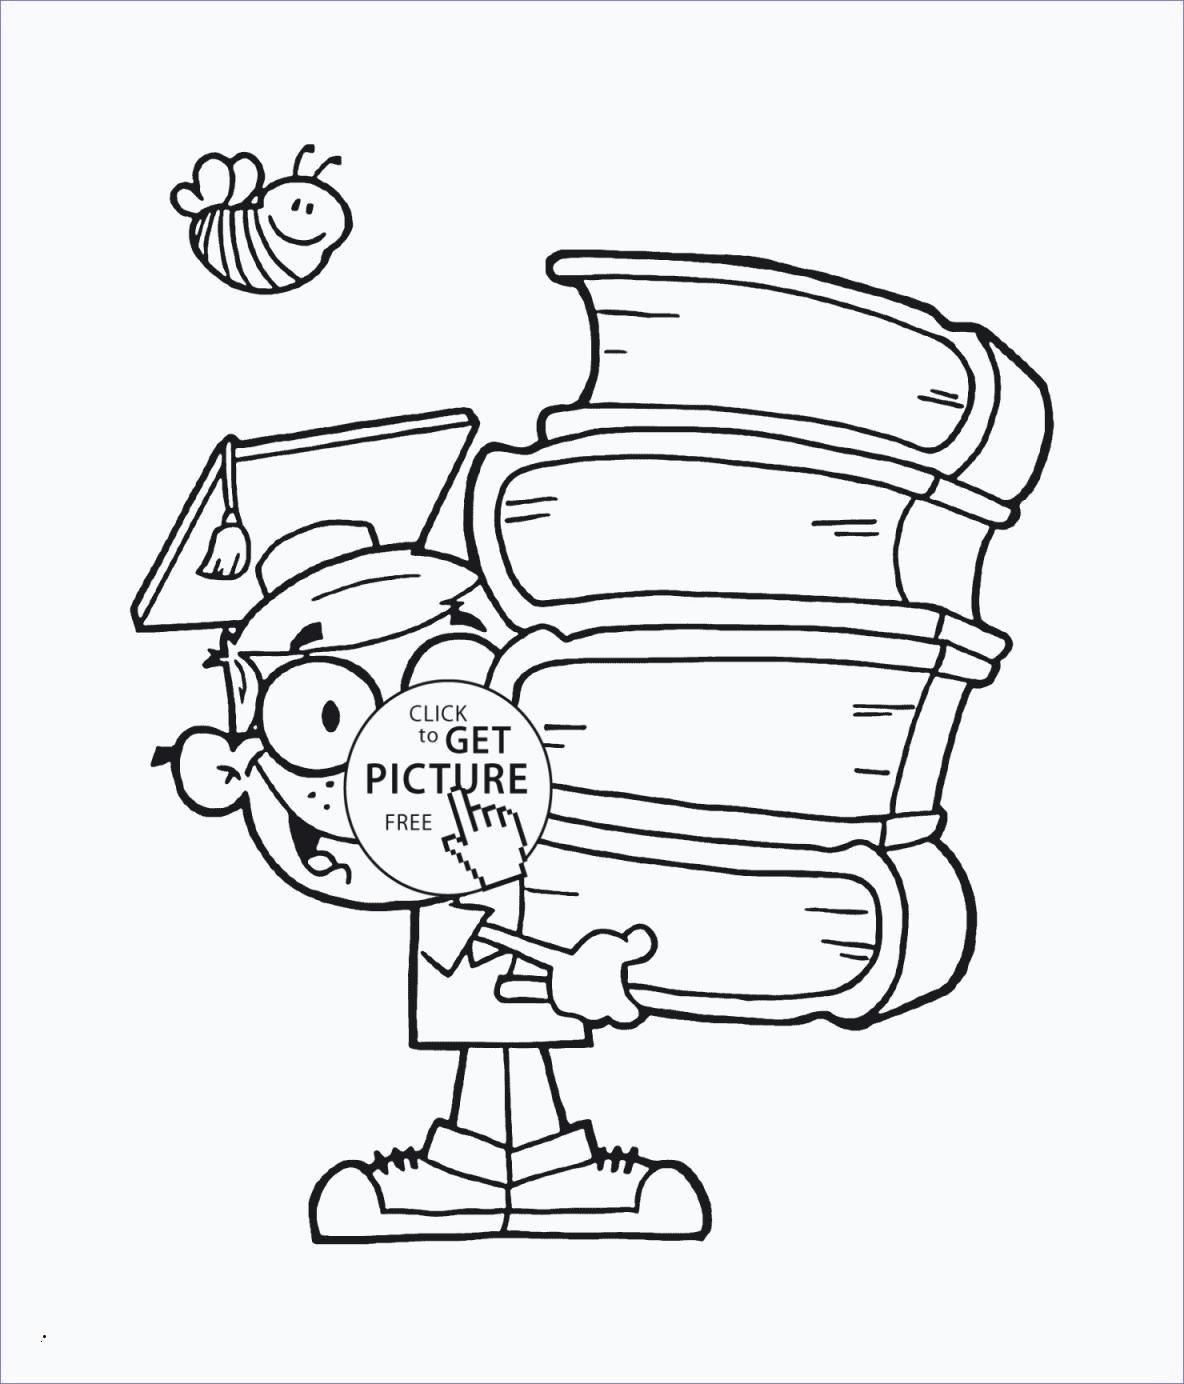 iron man disegno colorato inspirant photos malvorlagen igel frisch igel grundschule 0d archives uploadertalk